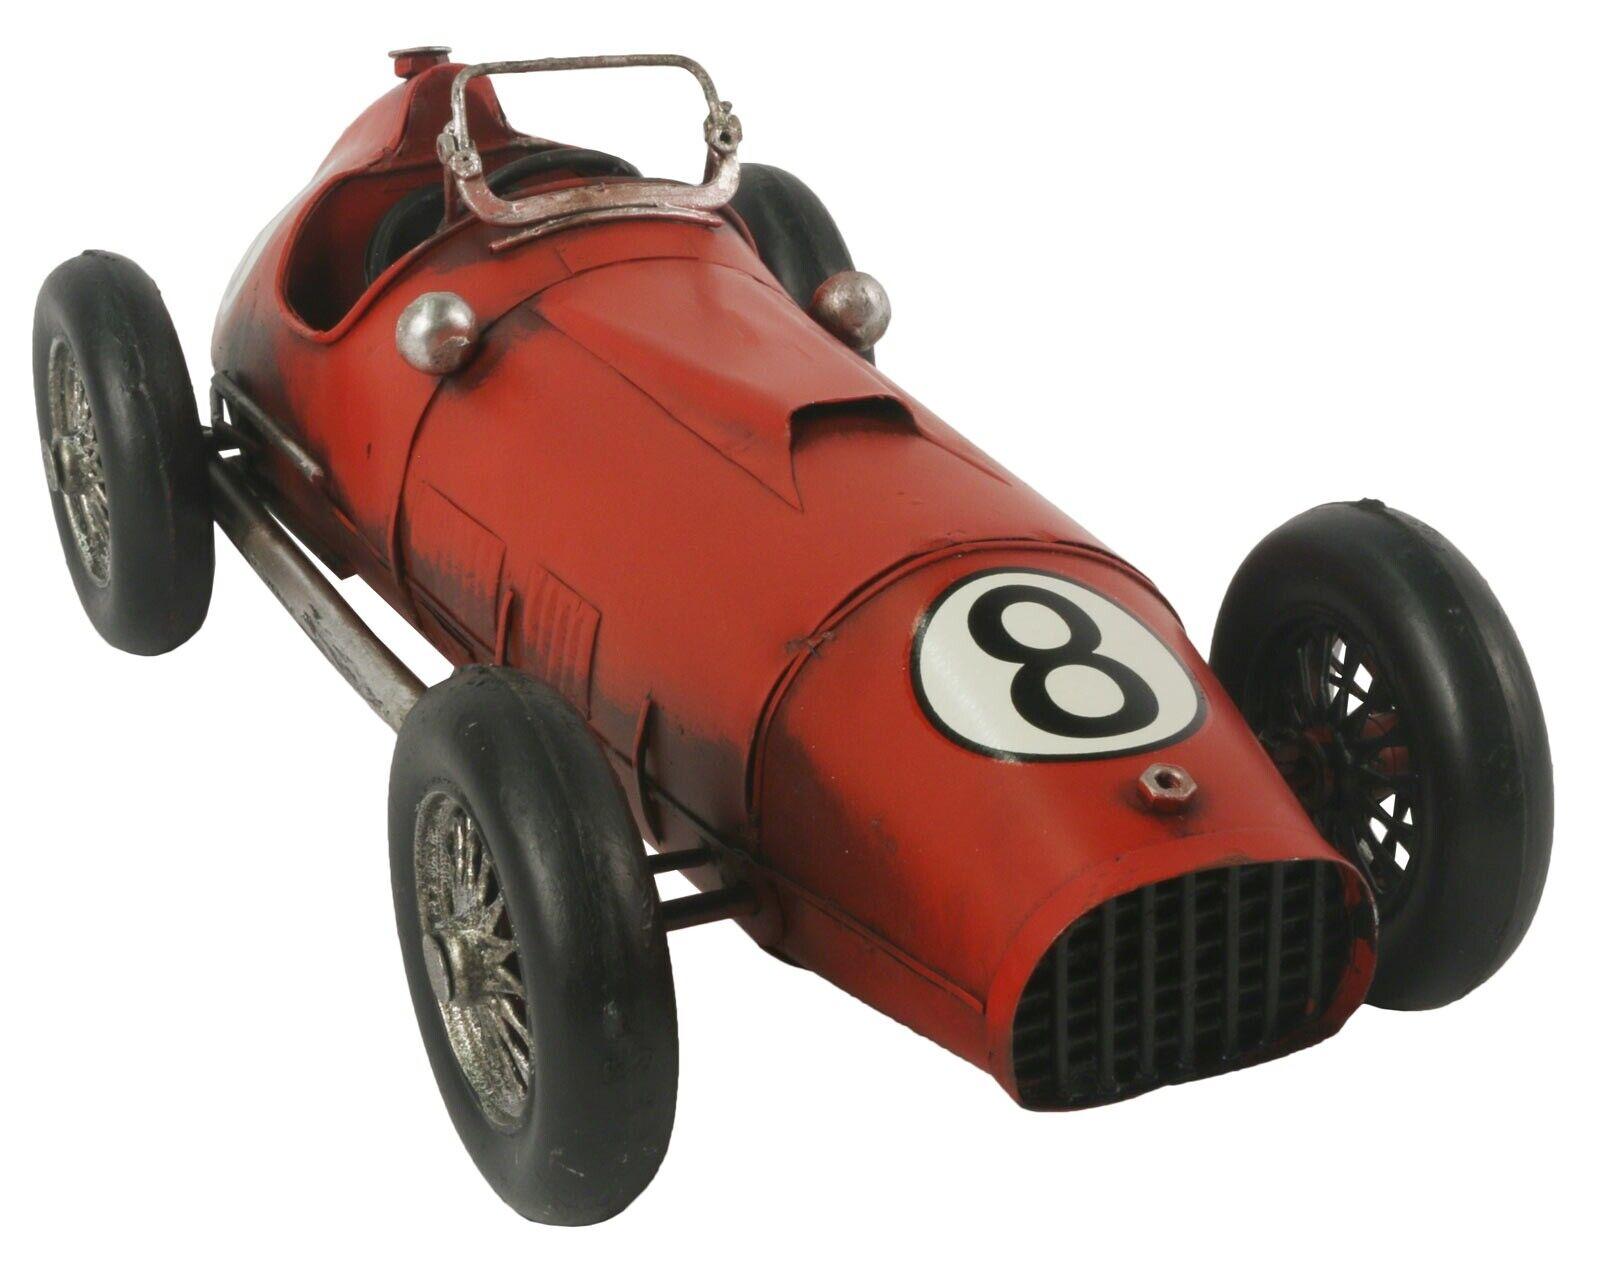 31.5CM VINTAGE RED 1950s RACING CAR NO 8 METAL DECORATIVE MODEL